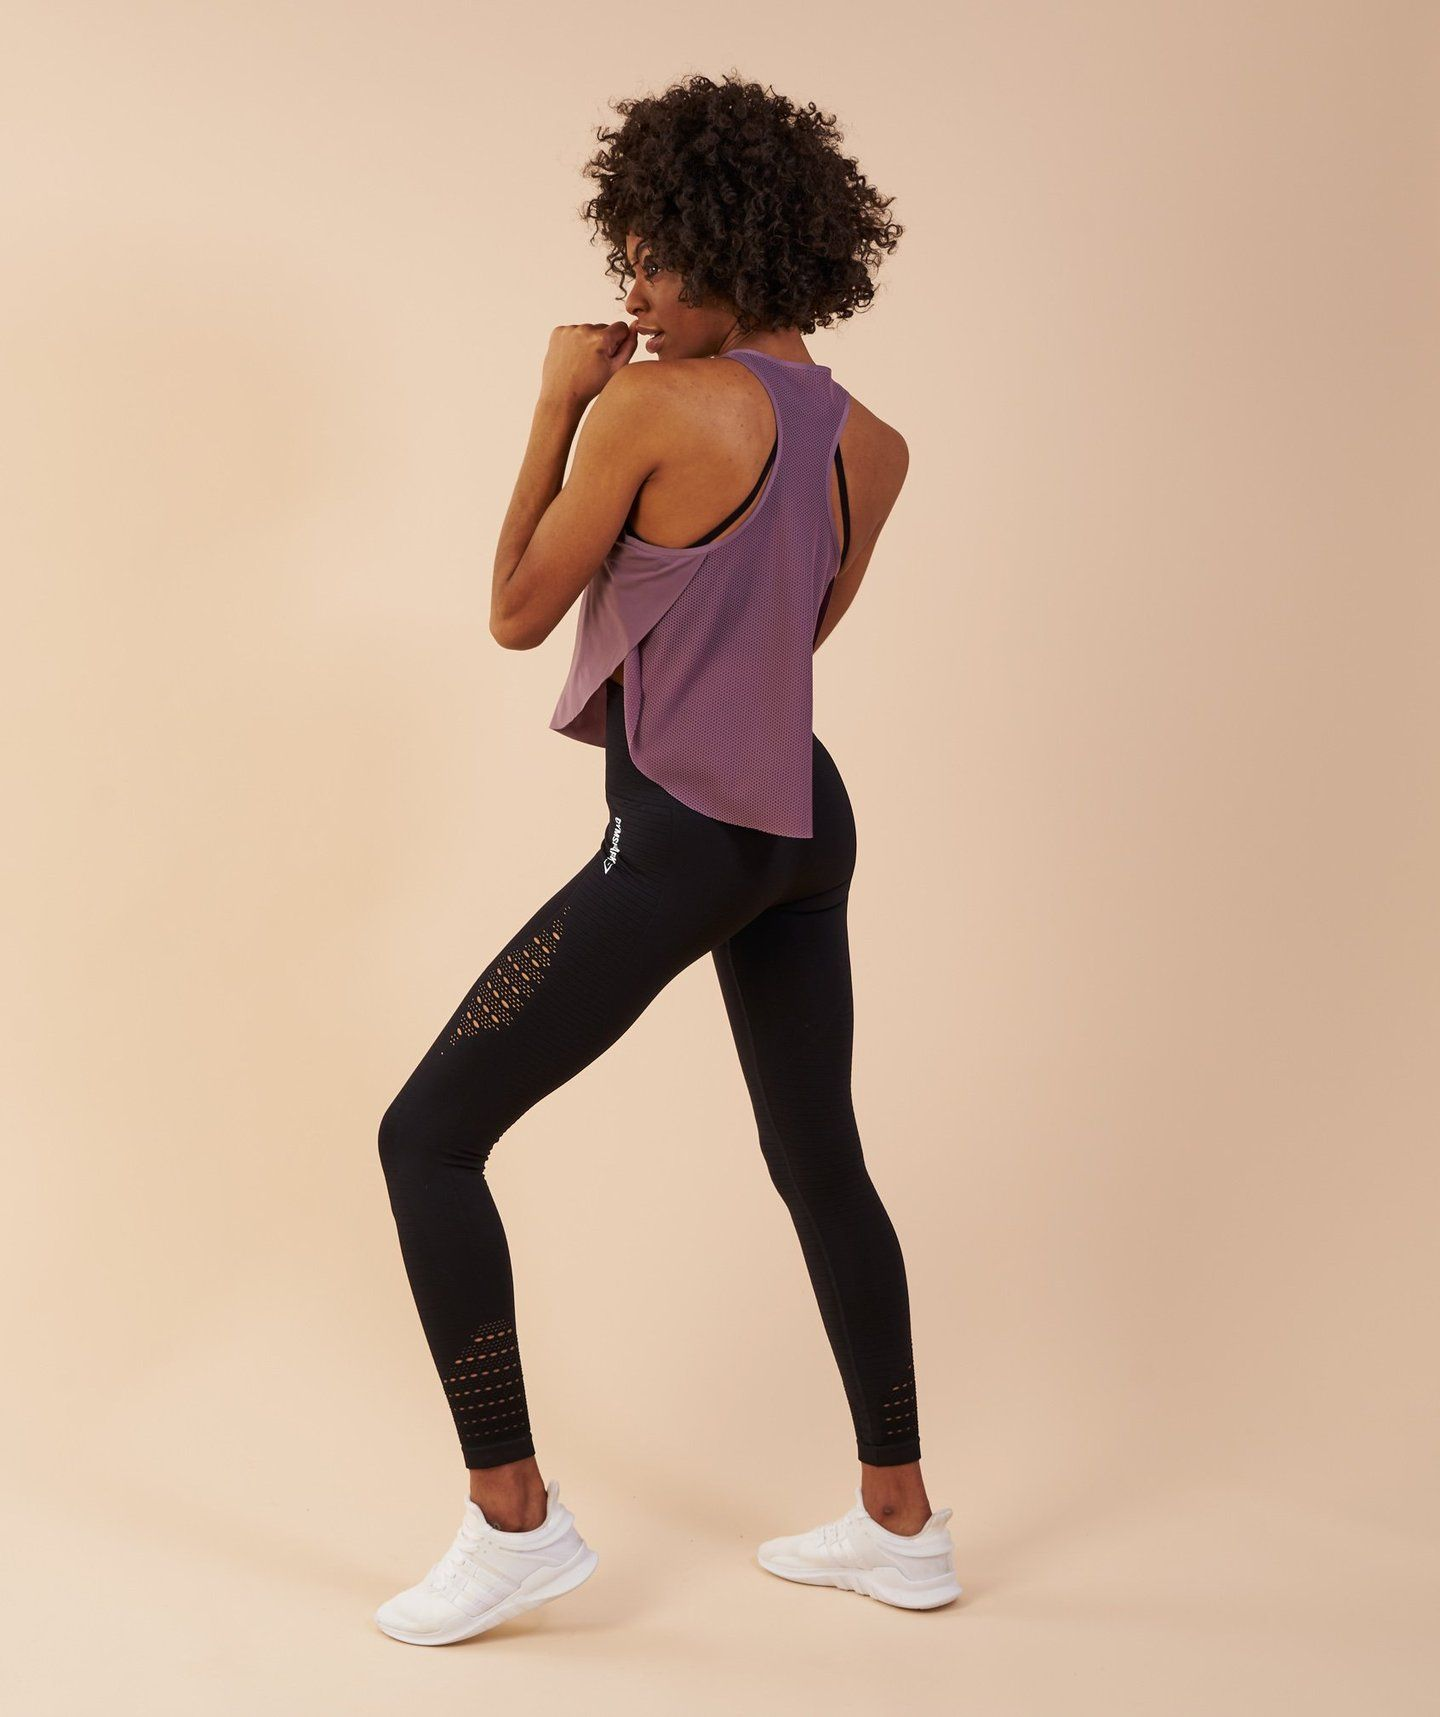 54611d303ee55 Gymshark Aptitude Cropped Vest - Purple Wash 2 | Fitness Clothing ...